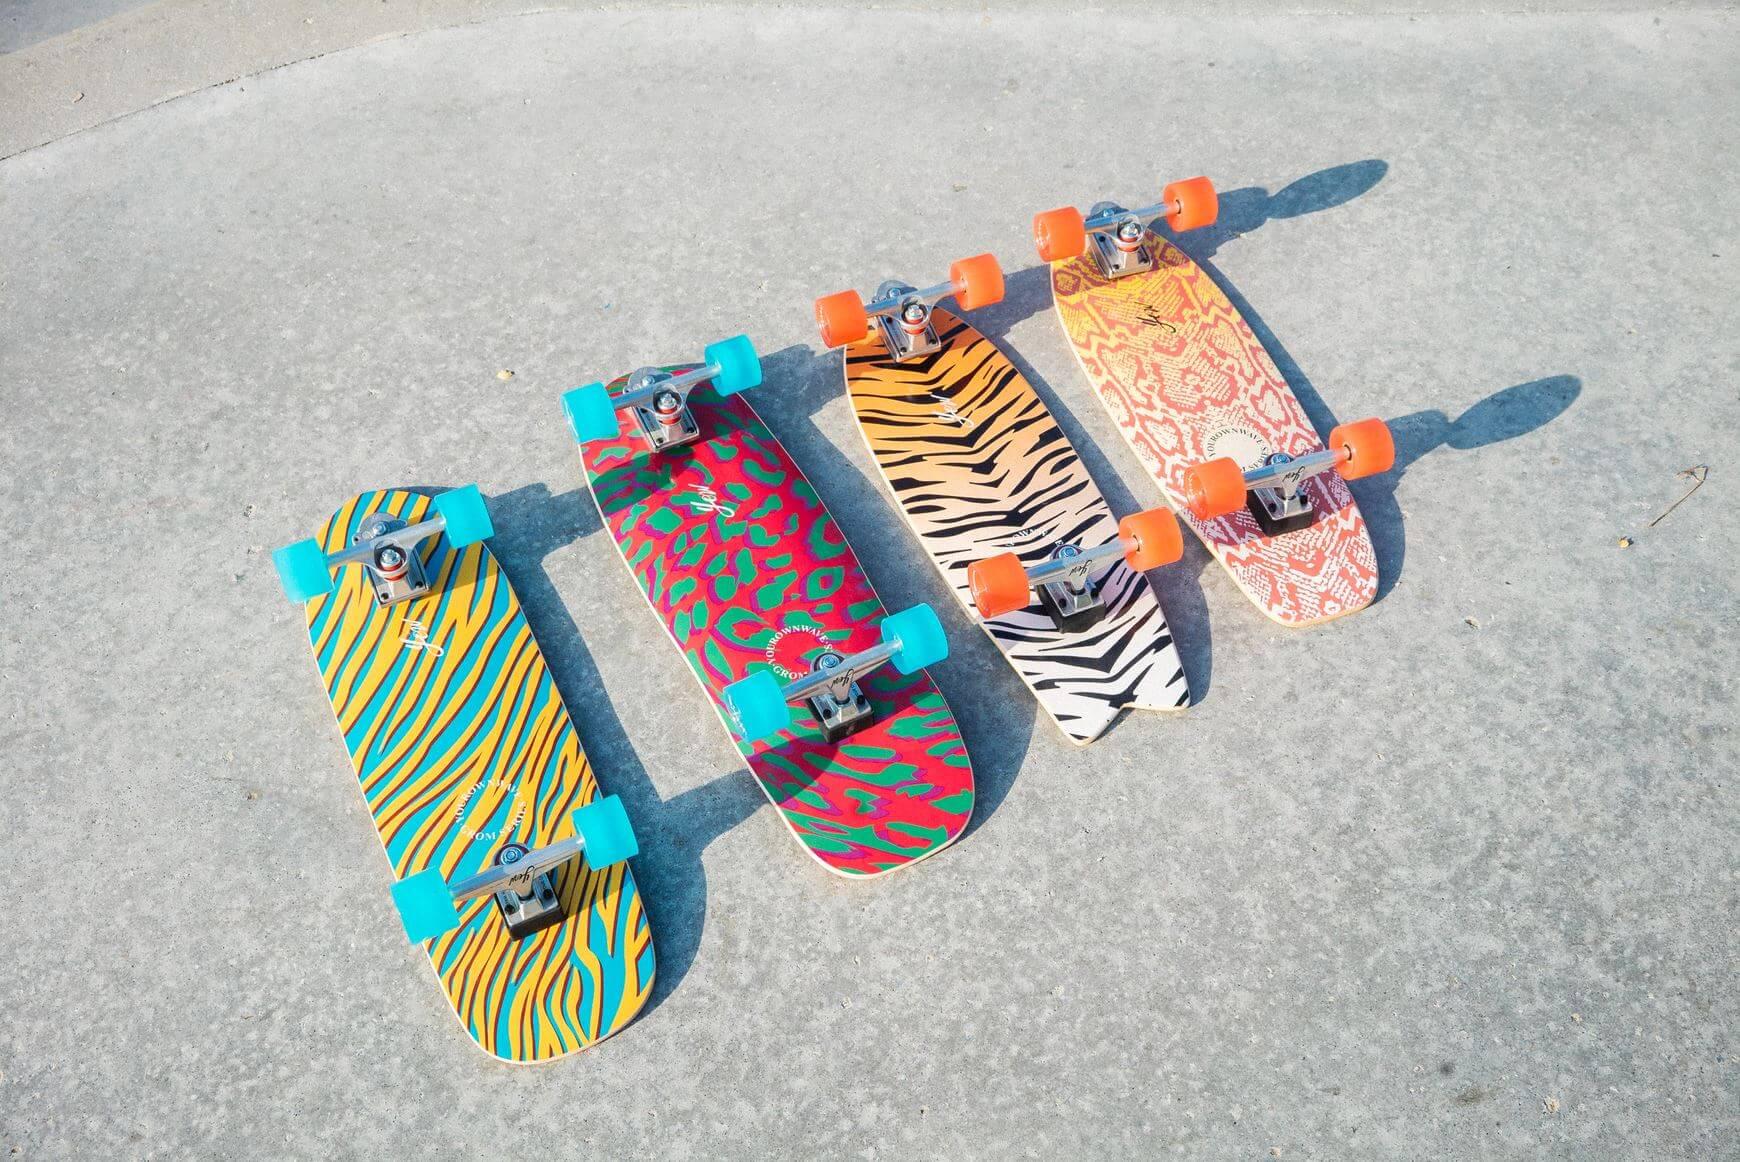 yow street surfing